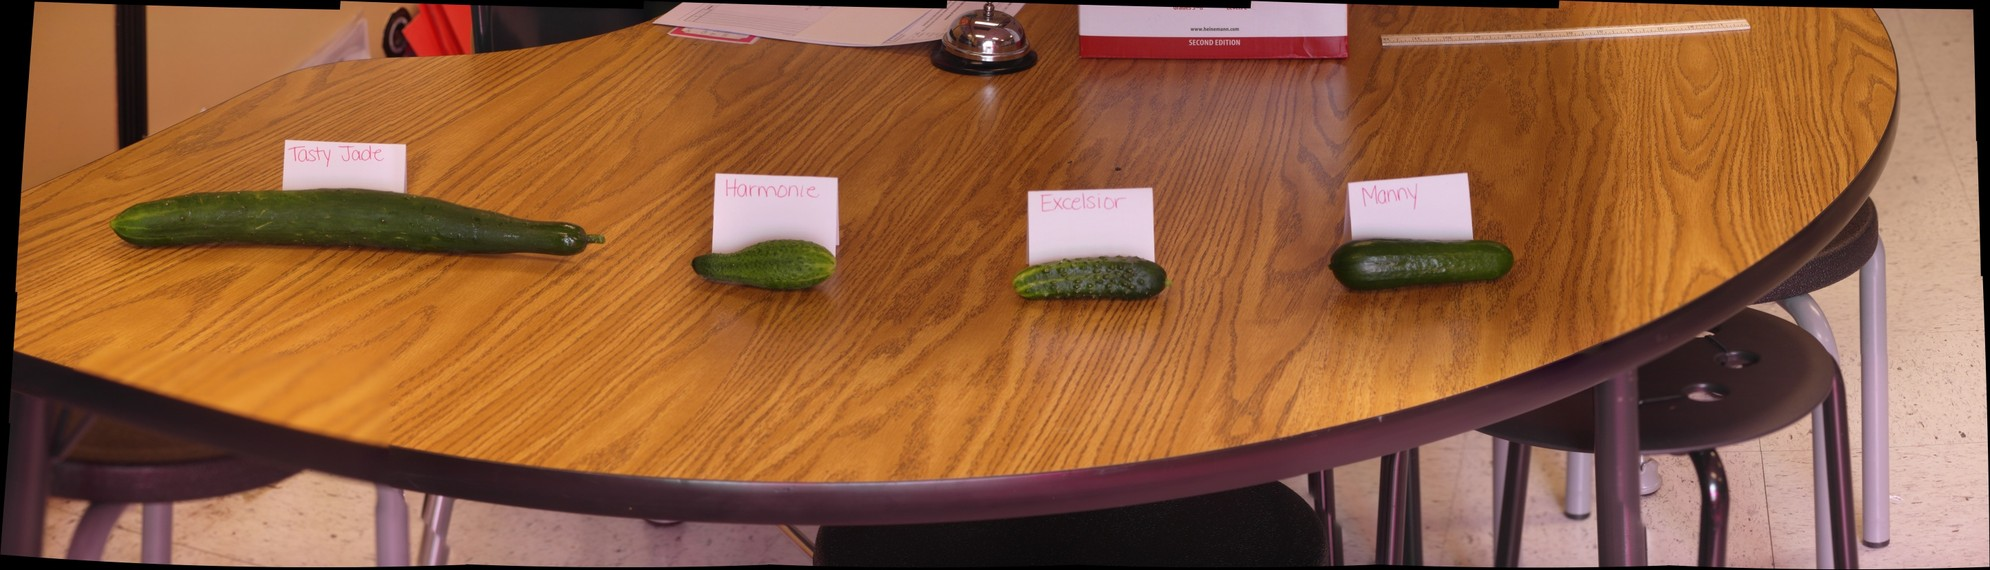 Cucumber Variety 4-29-16